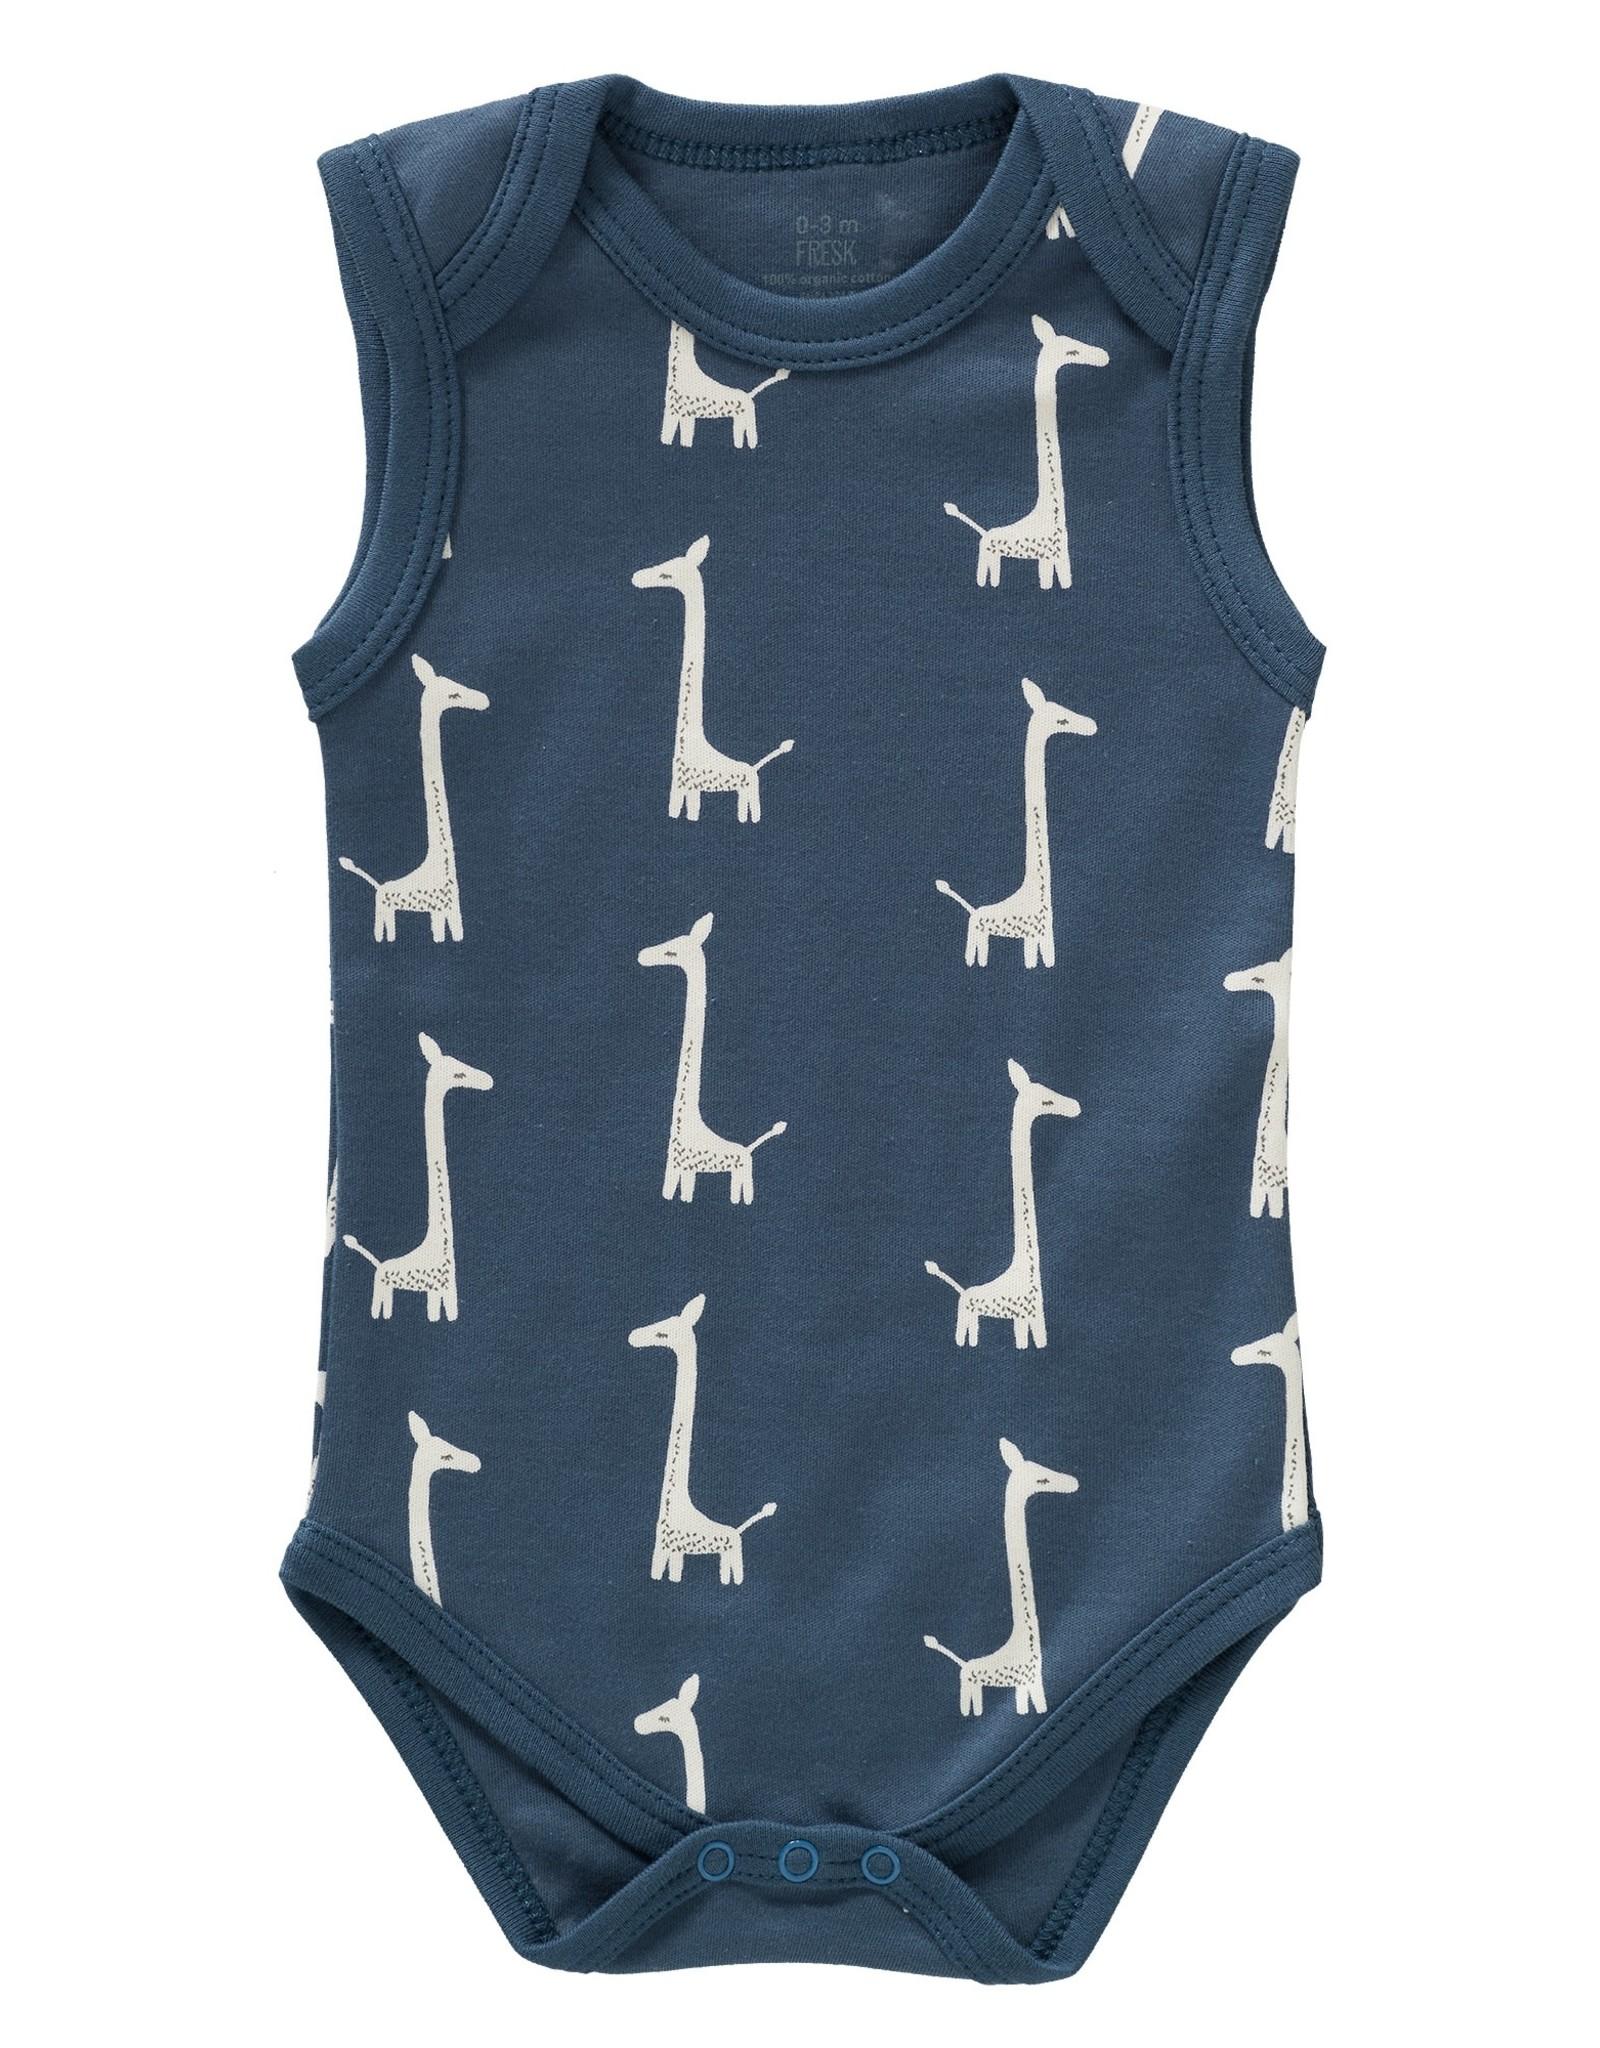 Fresk Rompertje Giraf Indigo blue